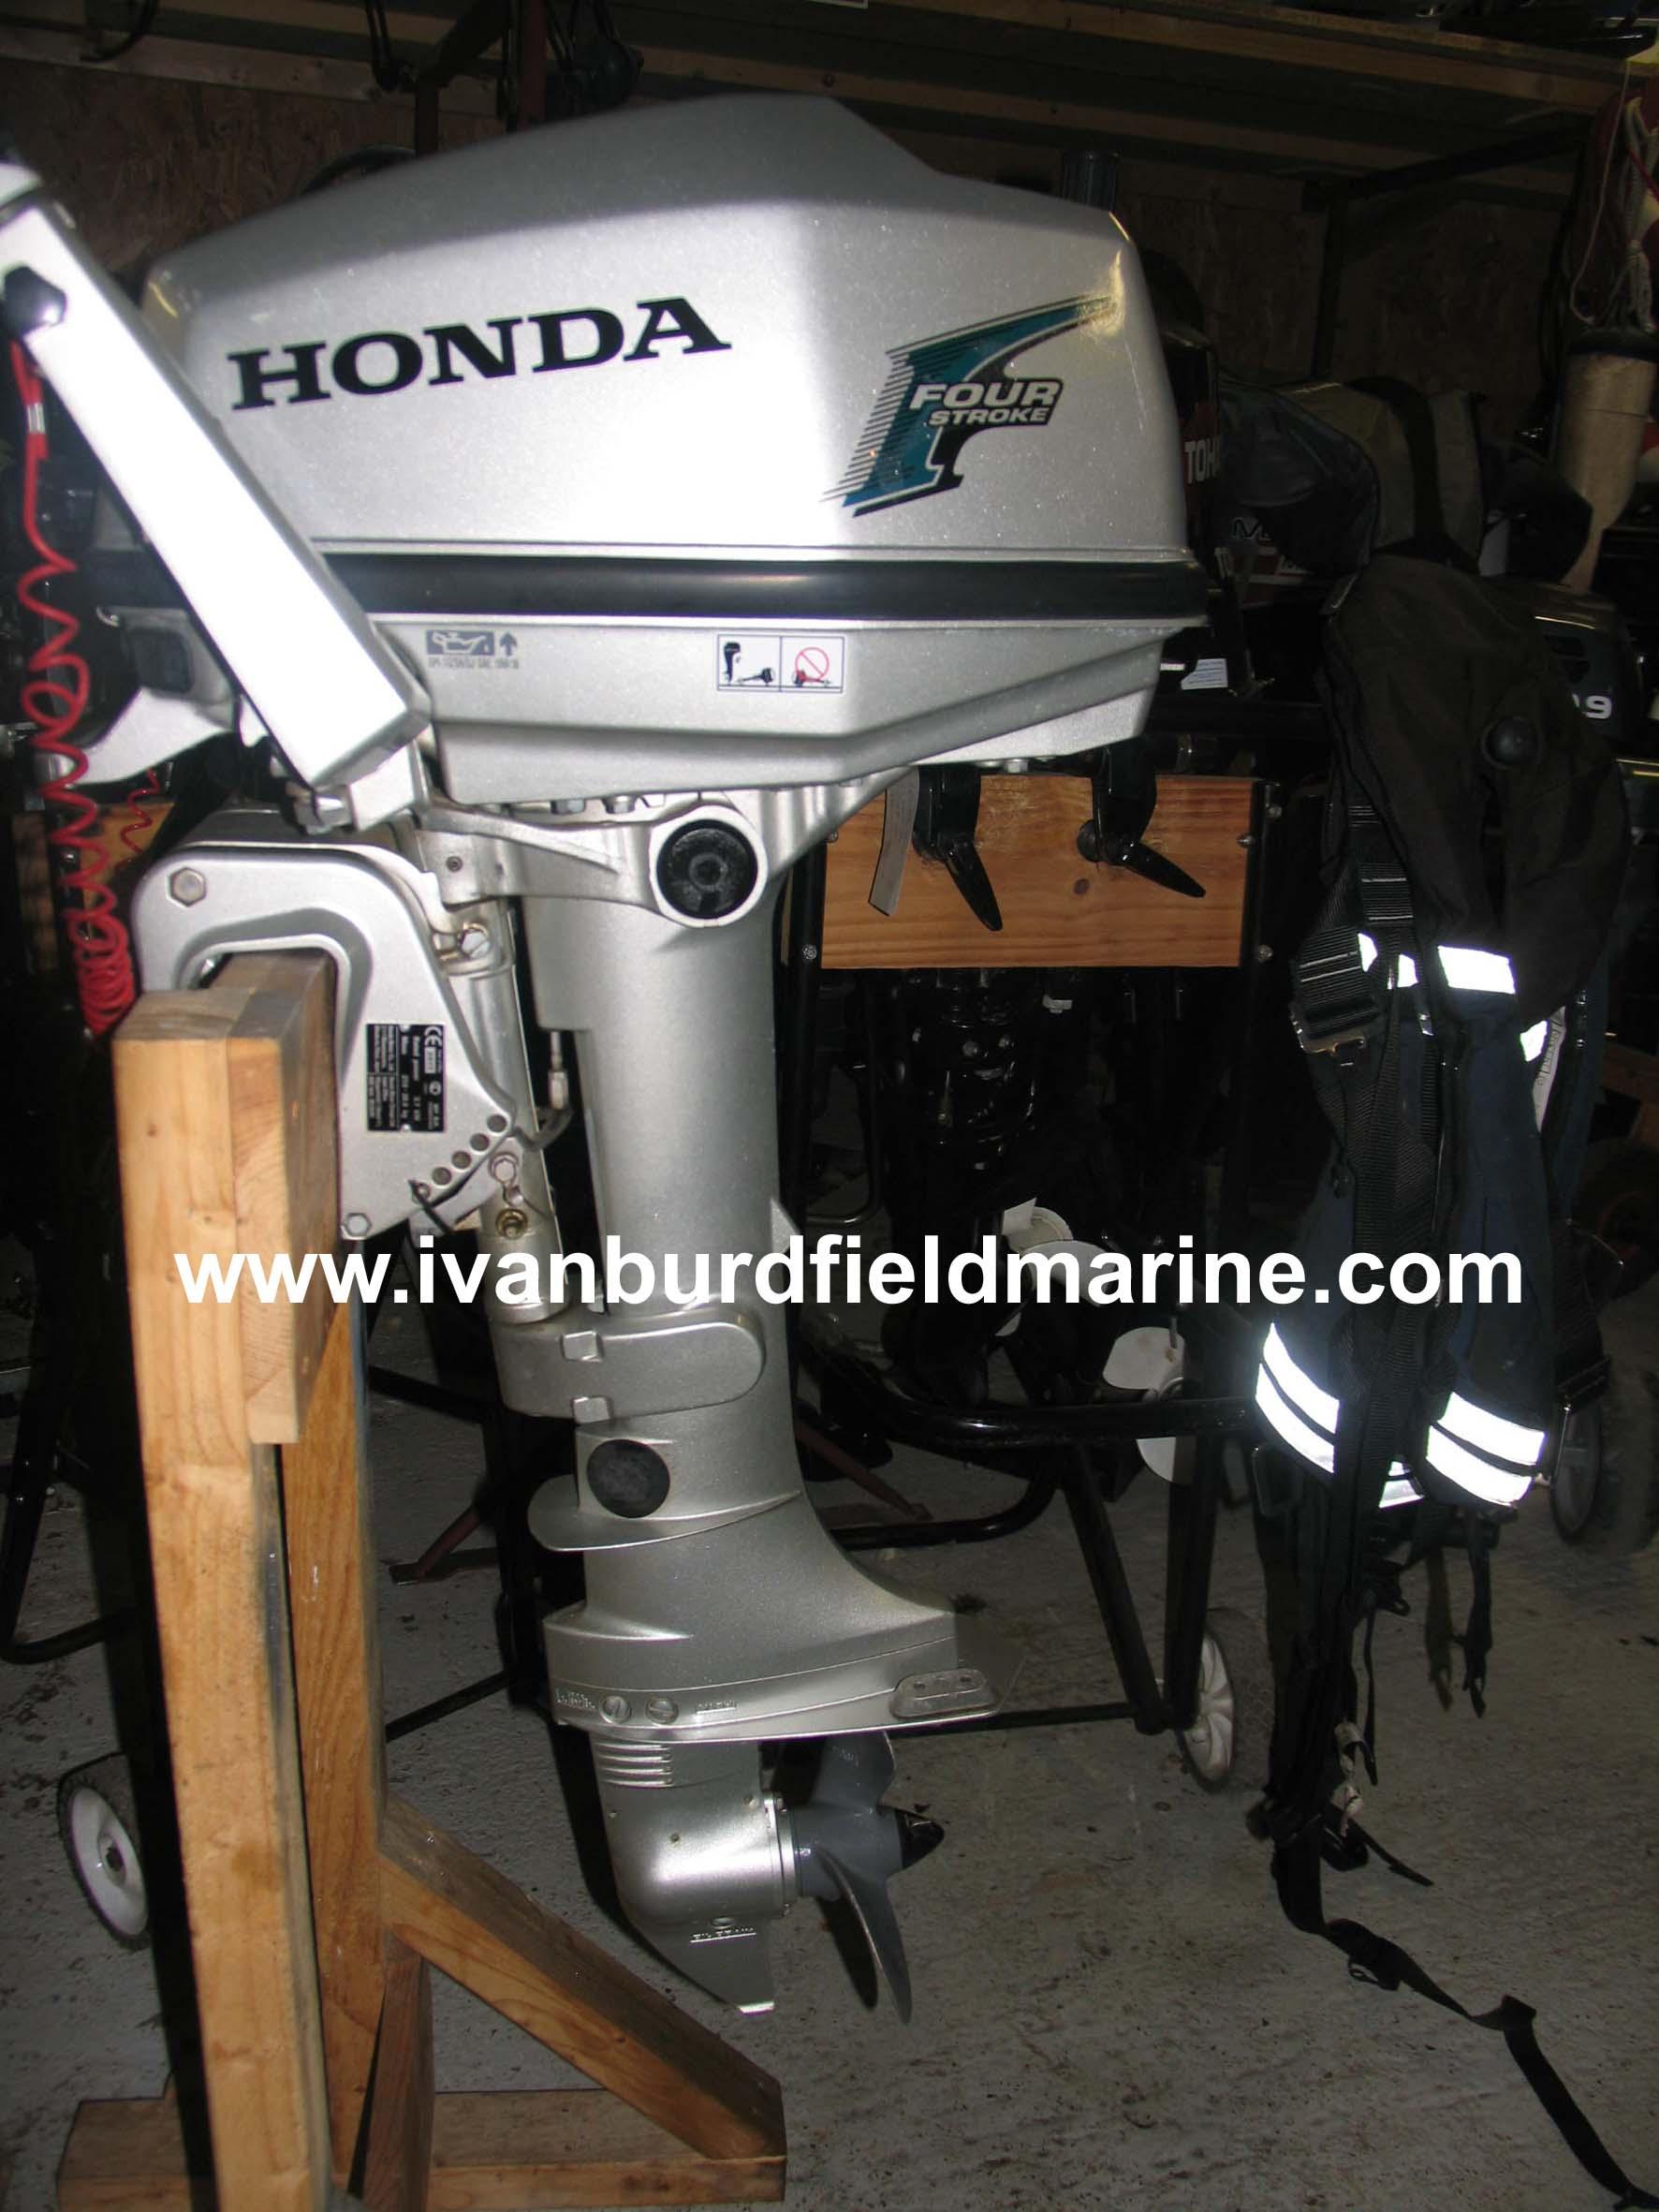 Honda 5hp outboard